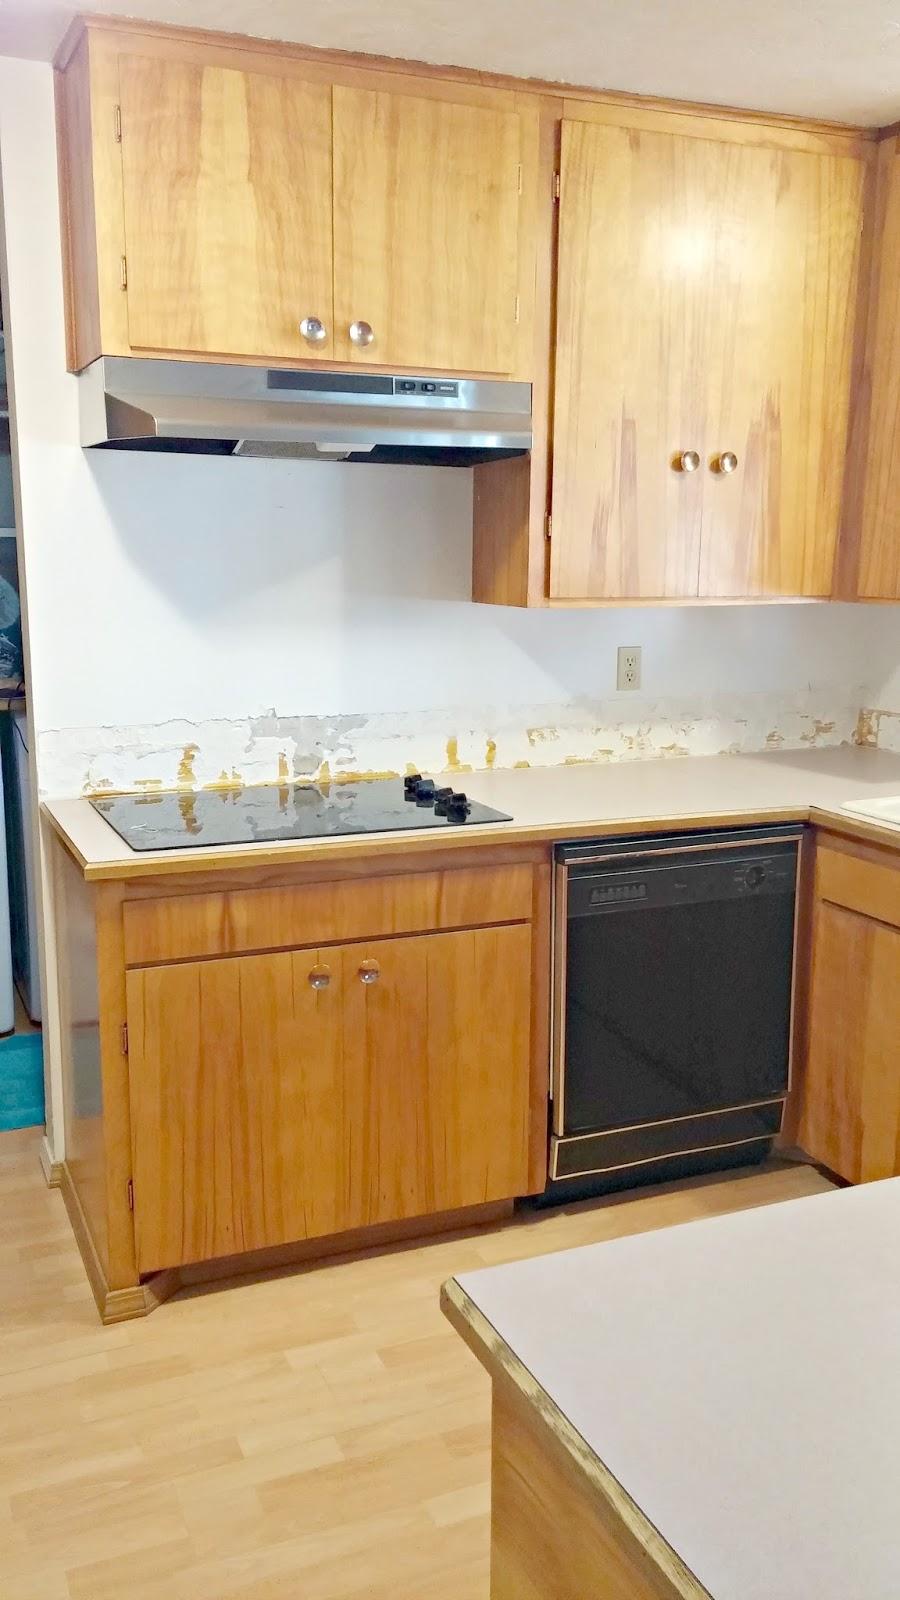 Craigslist Kitchen Cabinets 2020 - Home Comforts